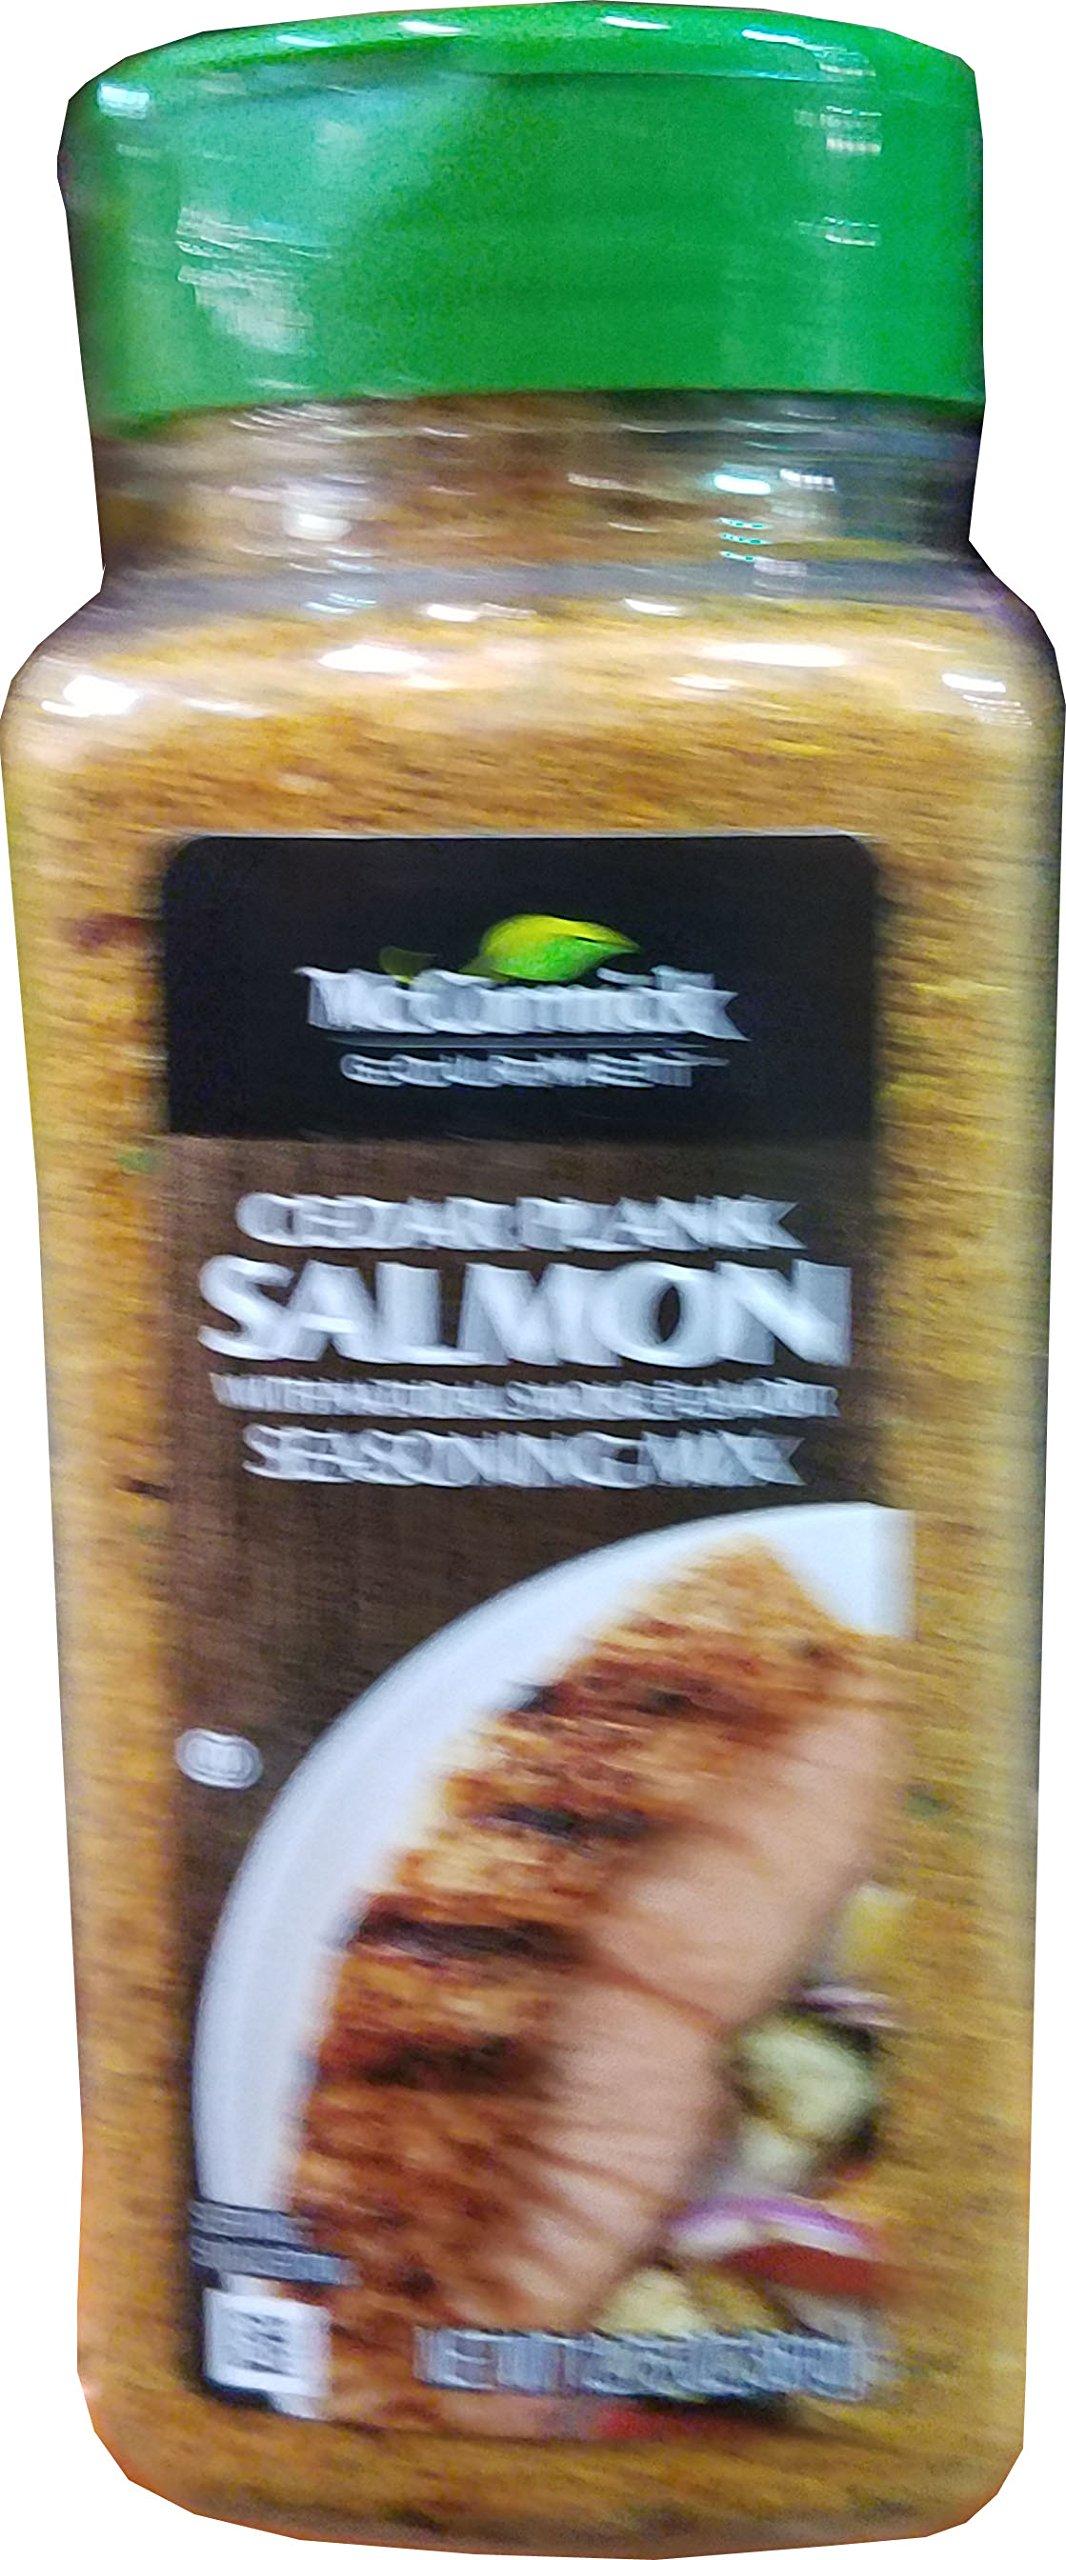 McCormick Gourmet Cedar Plank Salmon Seasoning, 12.75 Ounce